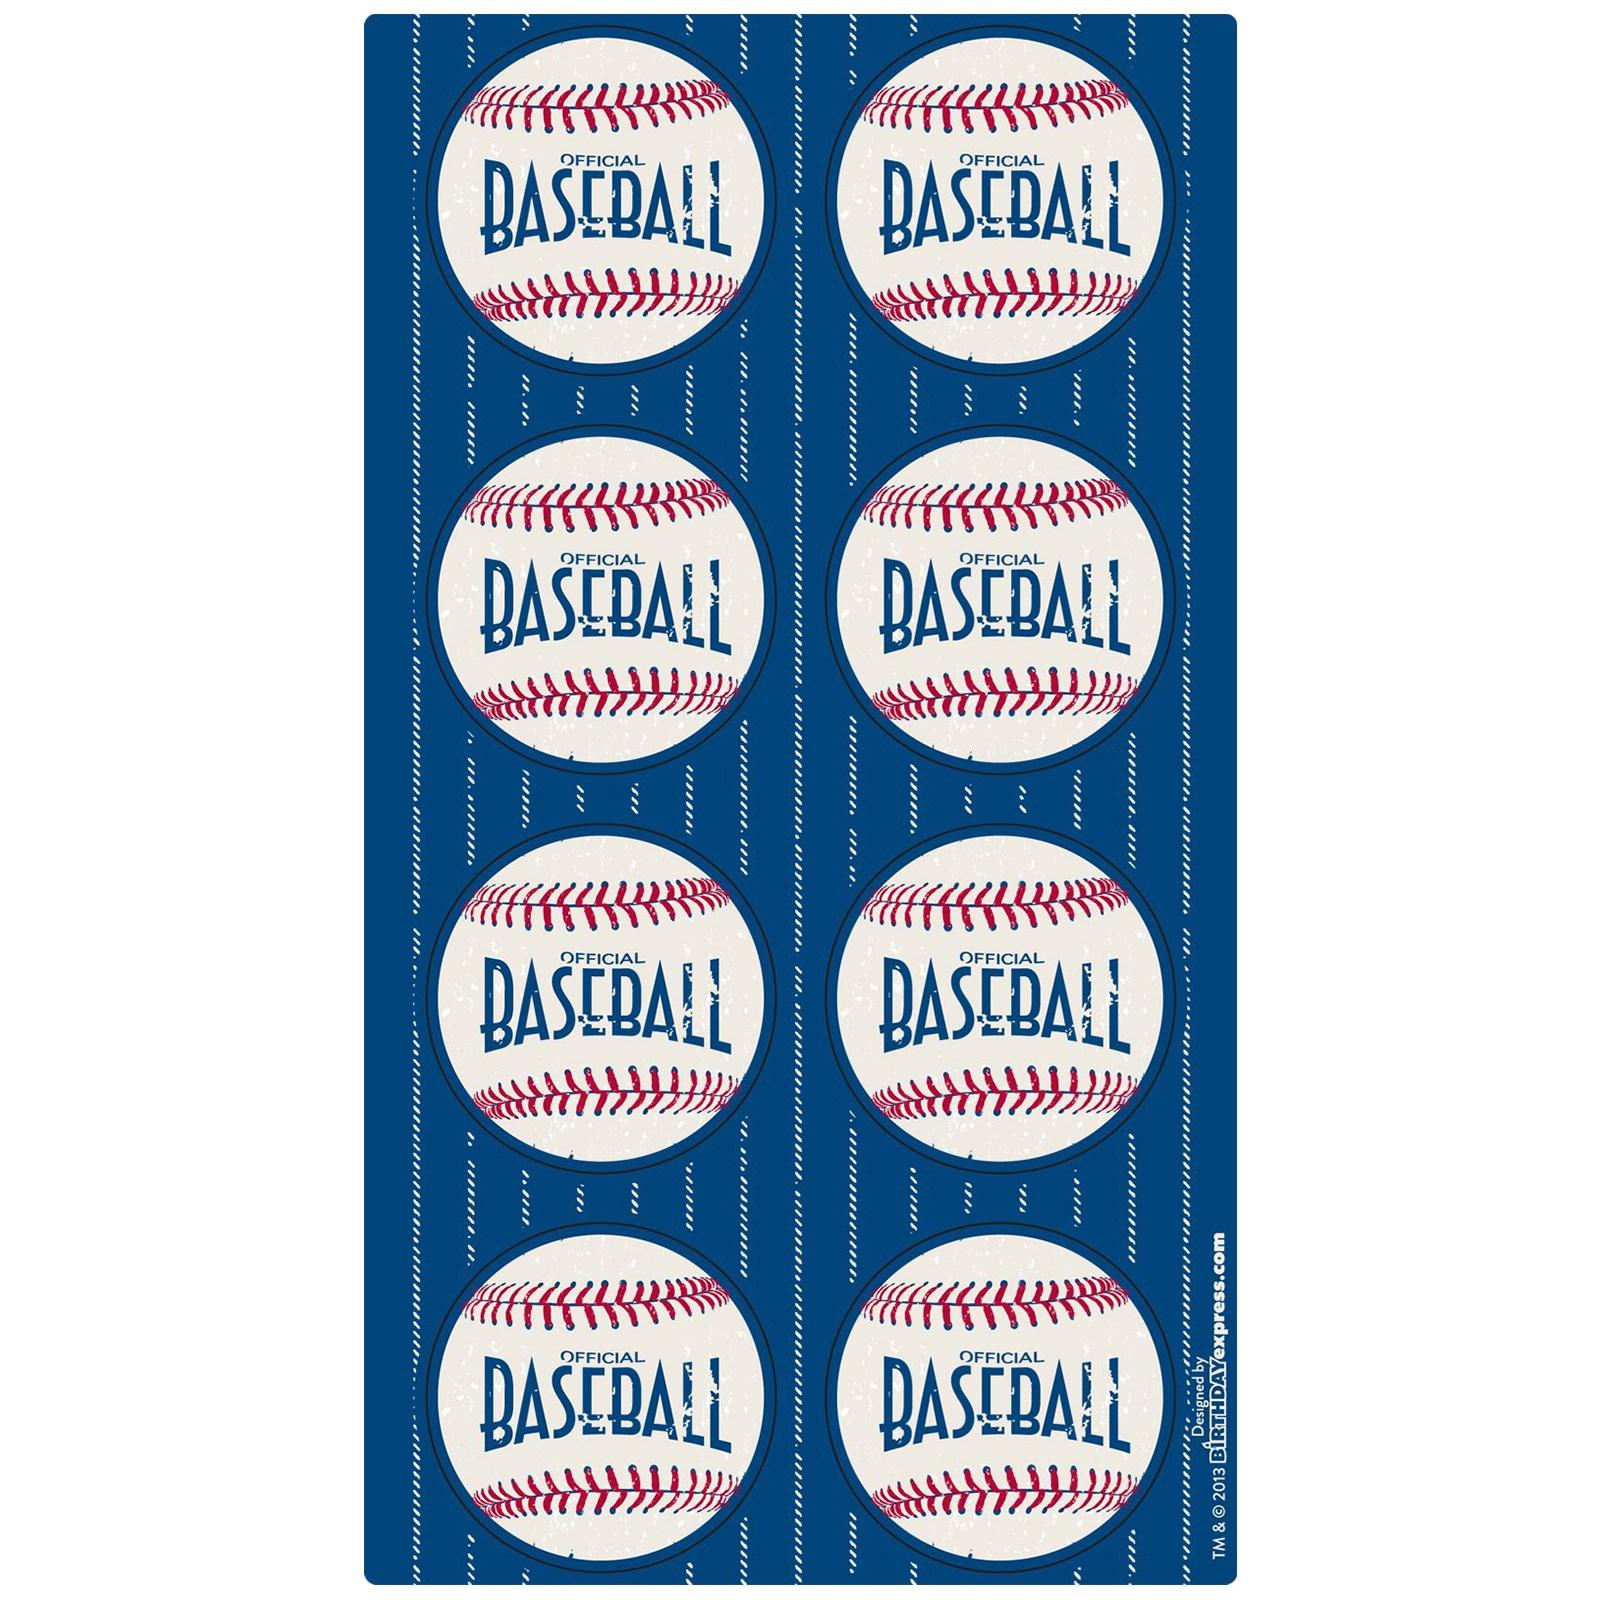 Image of Baseball Time Small Lollipop Sticker Sheet